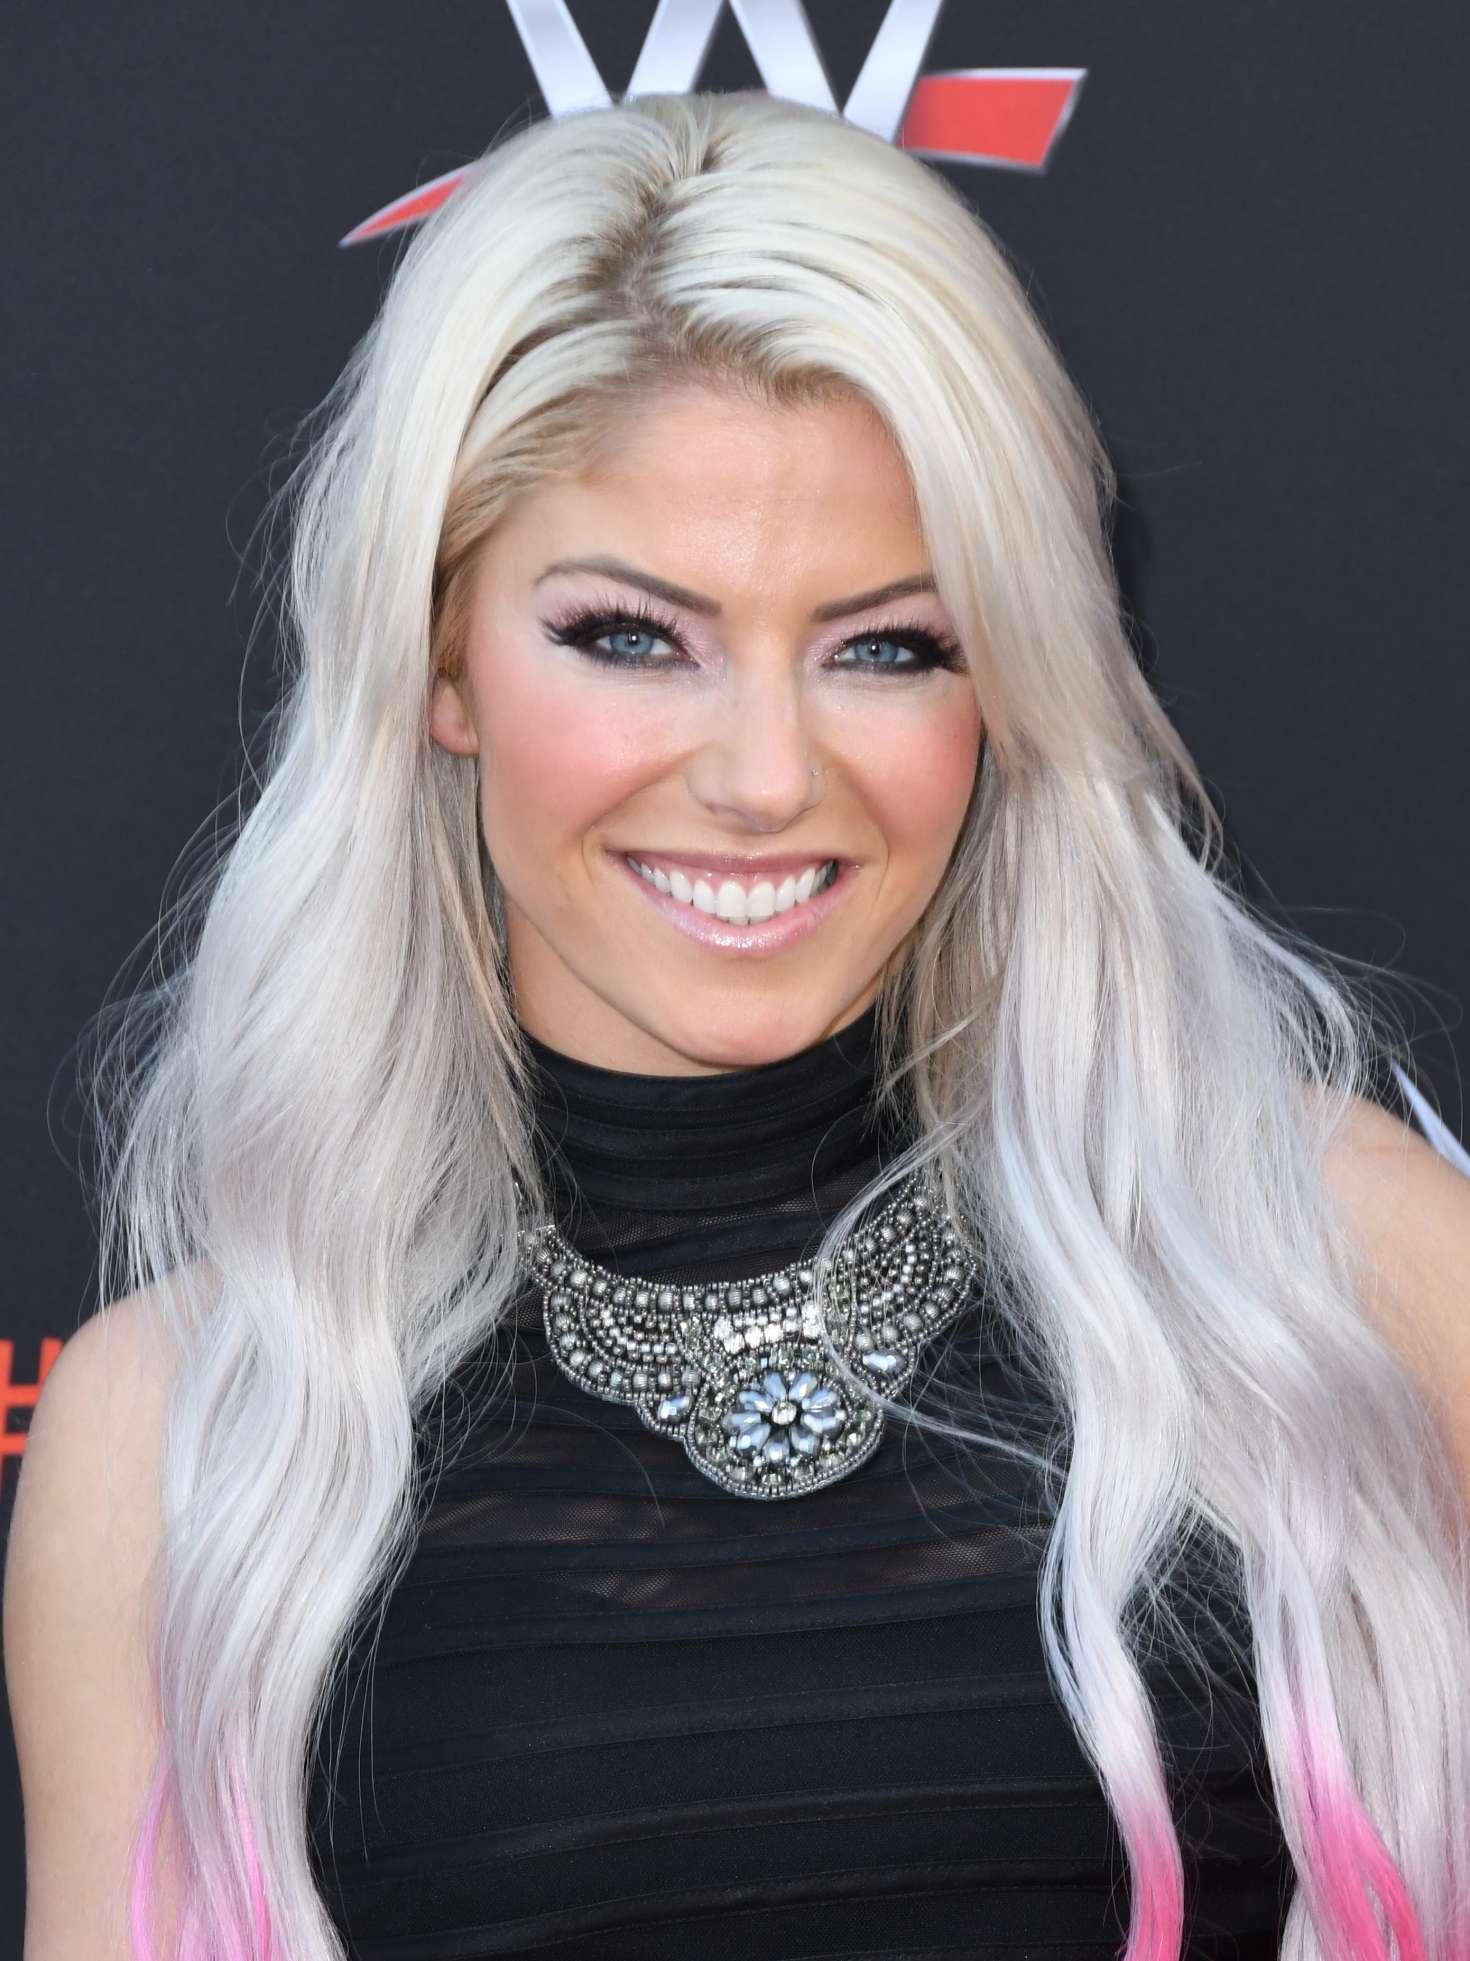 Alexa Bliss 2018 : Alexa Bliss: WWE FYC Event -06